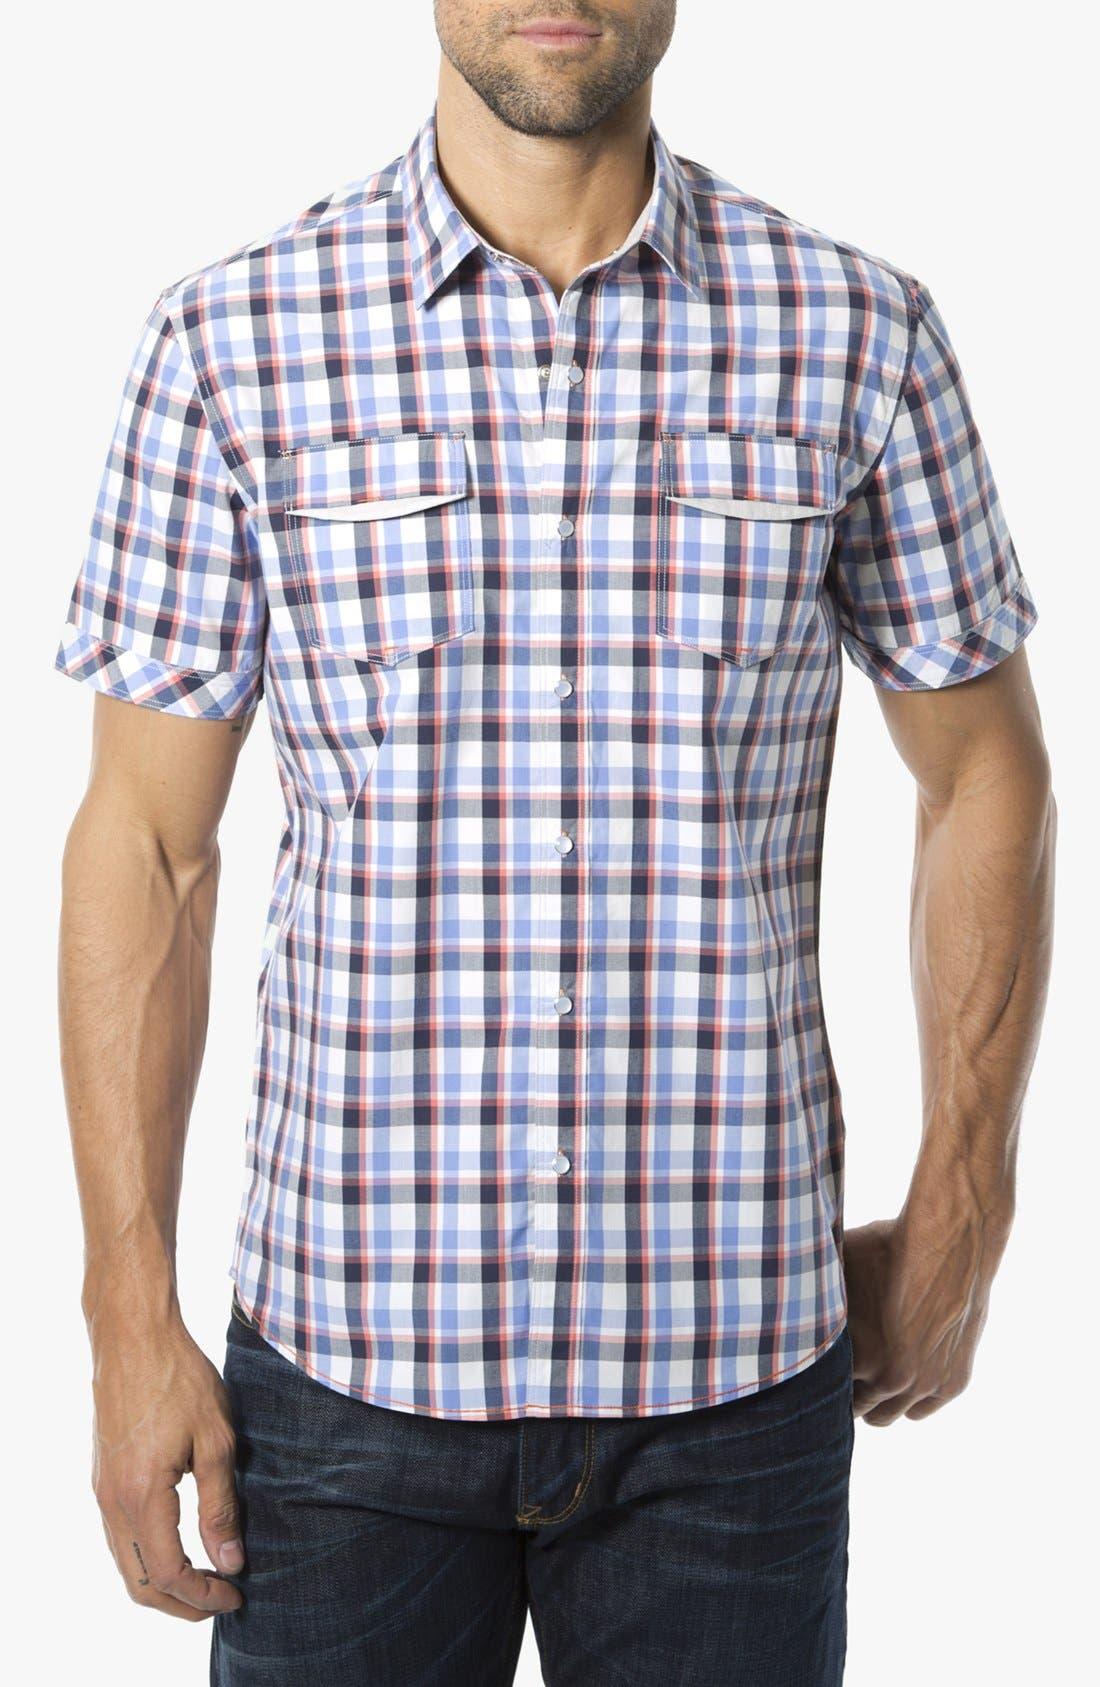 Alternate Image 1 Selected - 7 Diamonds 'Quick Exit' Woven Short Sleeve Shirt